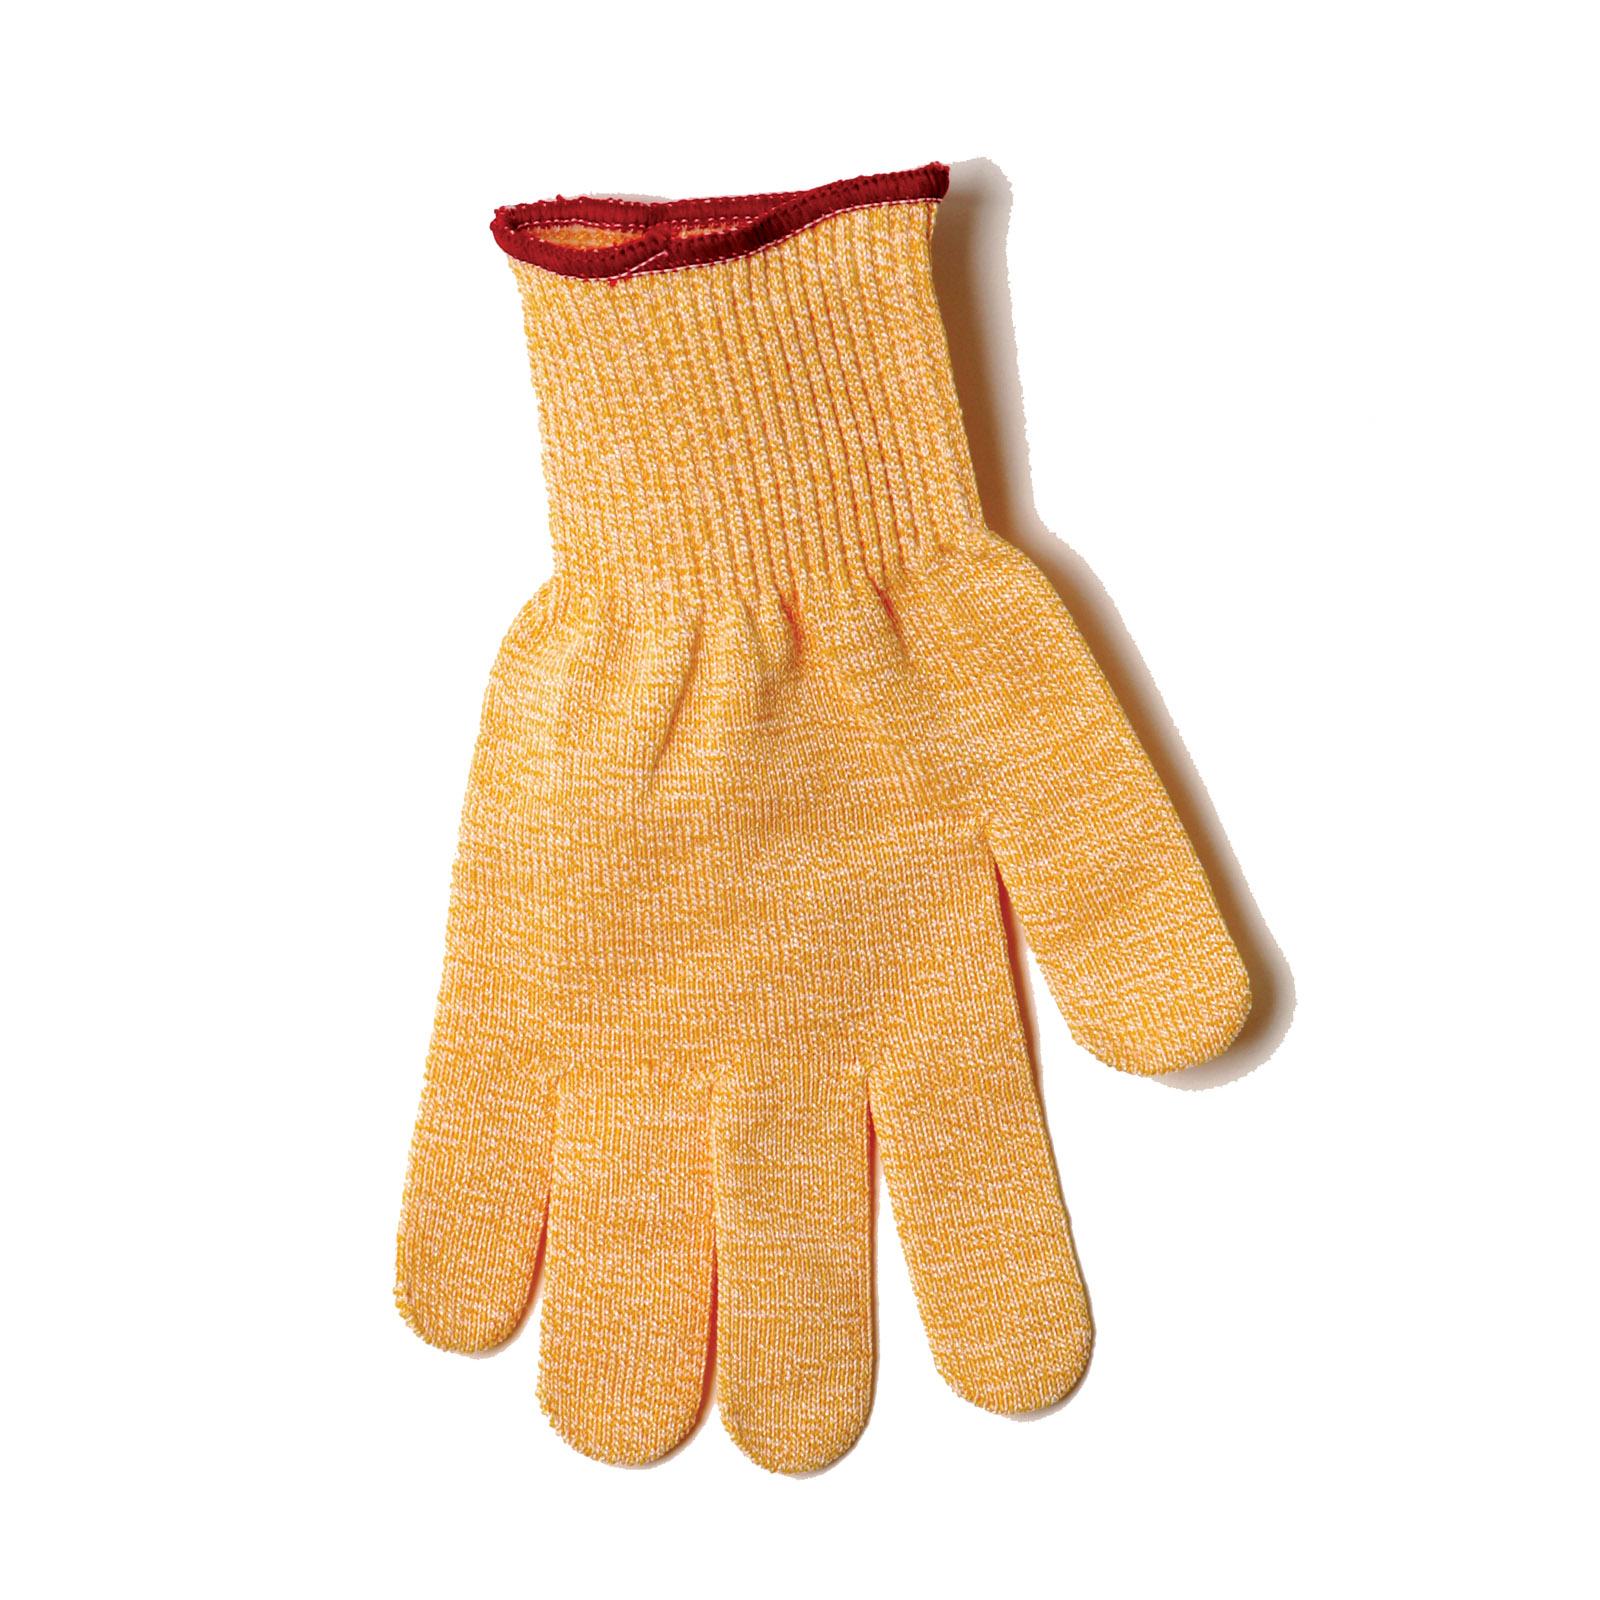 San Jamar SG10-Y-L glove, cut resistant